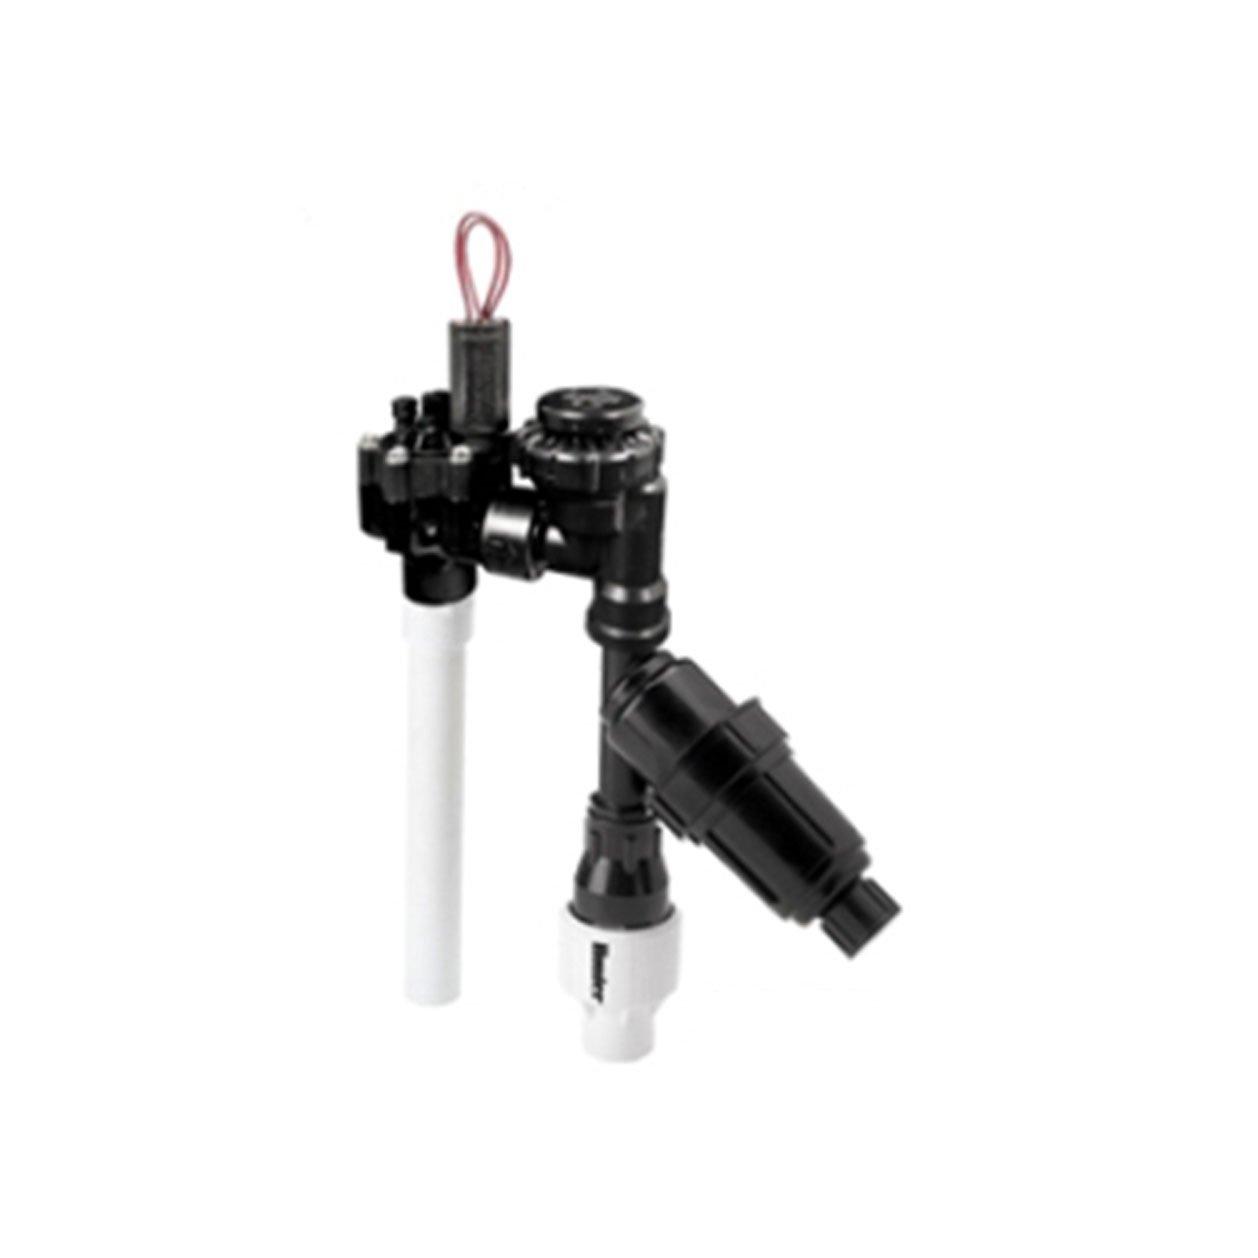 Hunter Sprinkler ACZ07525 Drip Zone Control 3/4-Inch Kit with 25 PSI Pressure